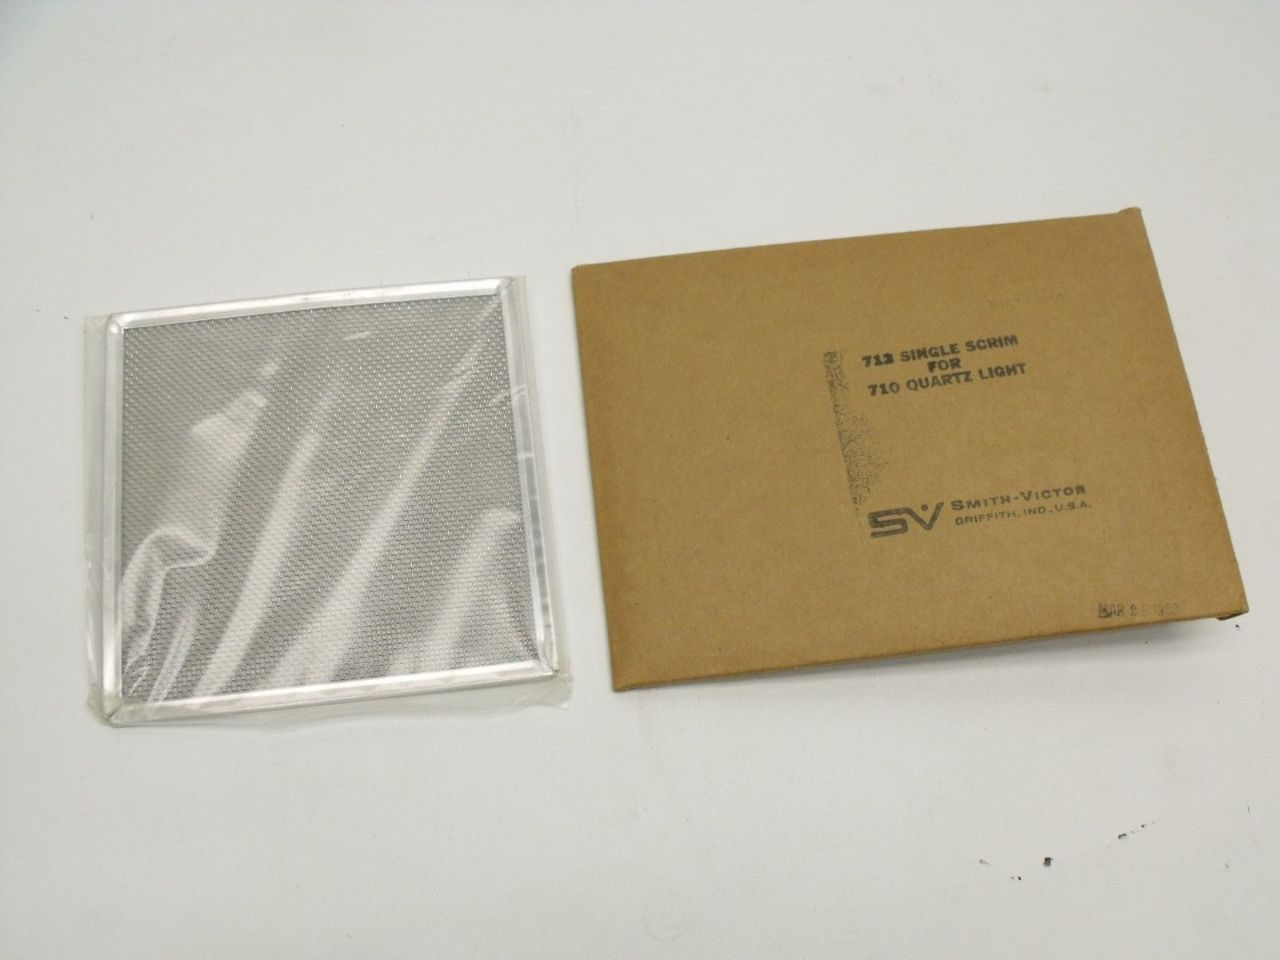 NEW Smith-Victor SV 712 Single Scrim for 710 Quartz Light